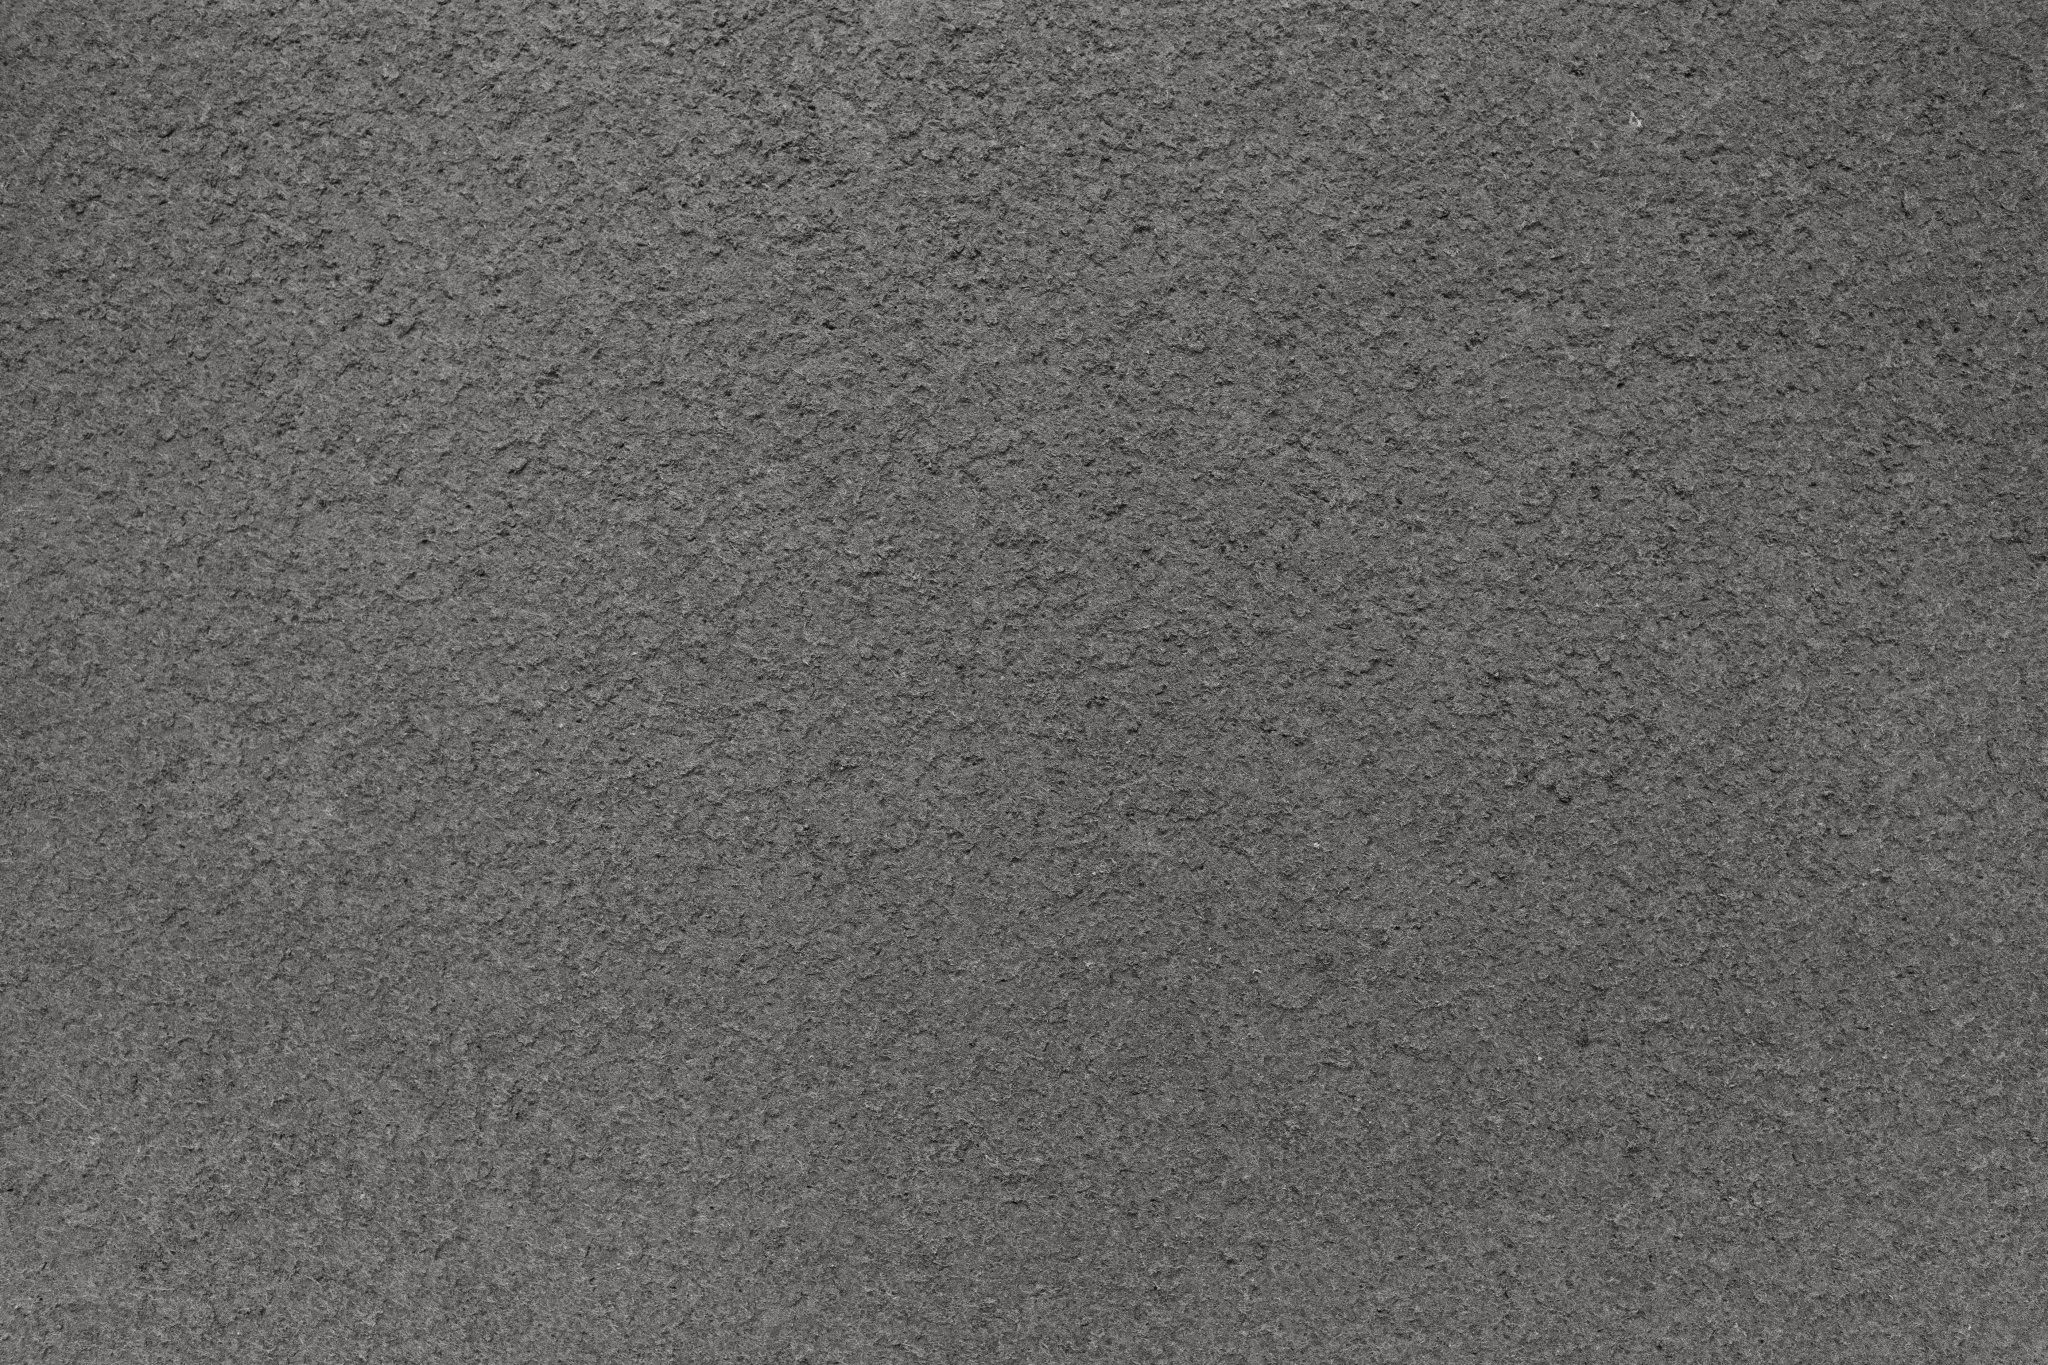 Bbs Facades Ltd 187 Equitone Materia